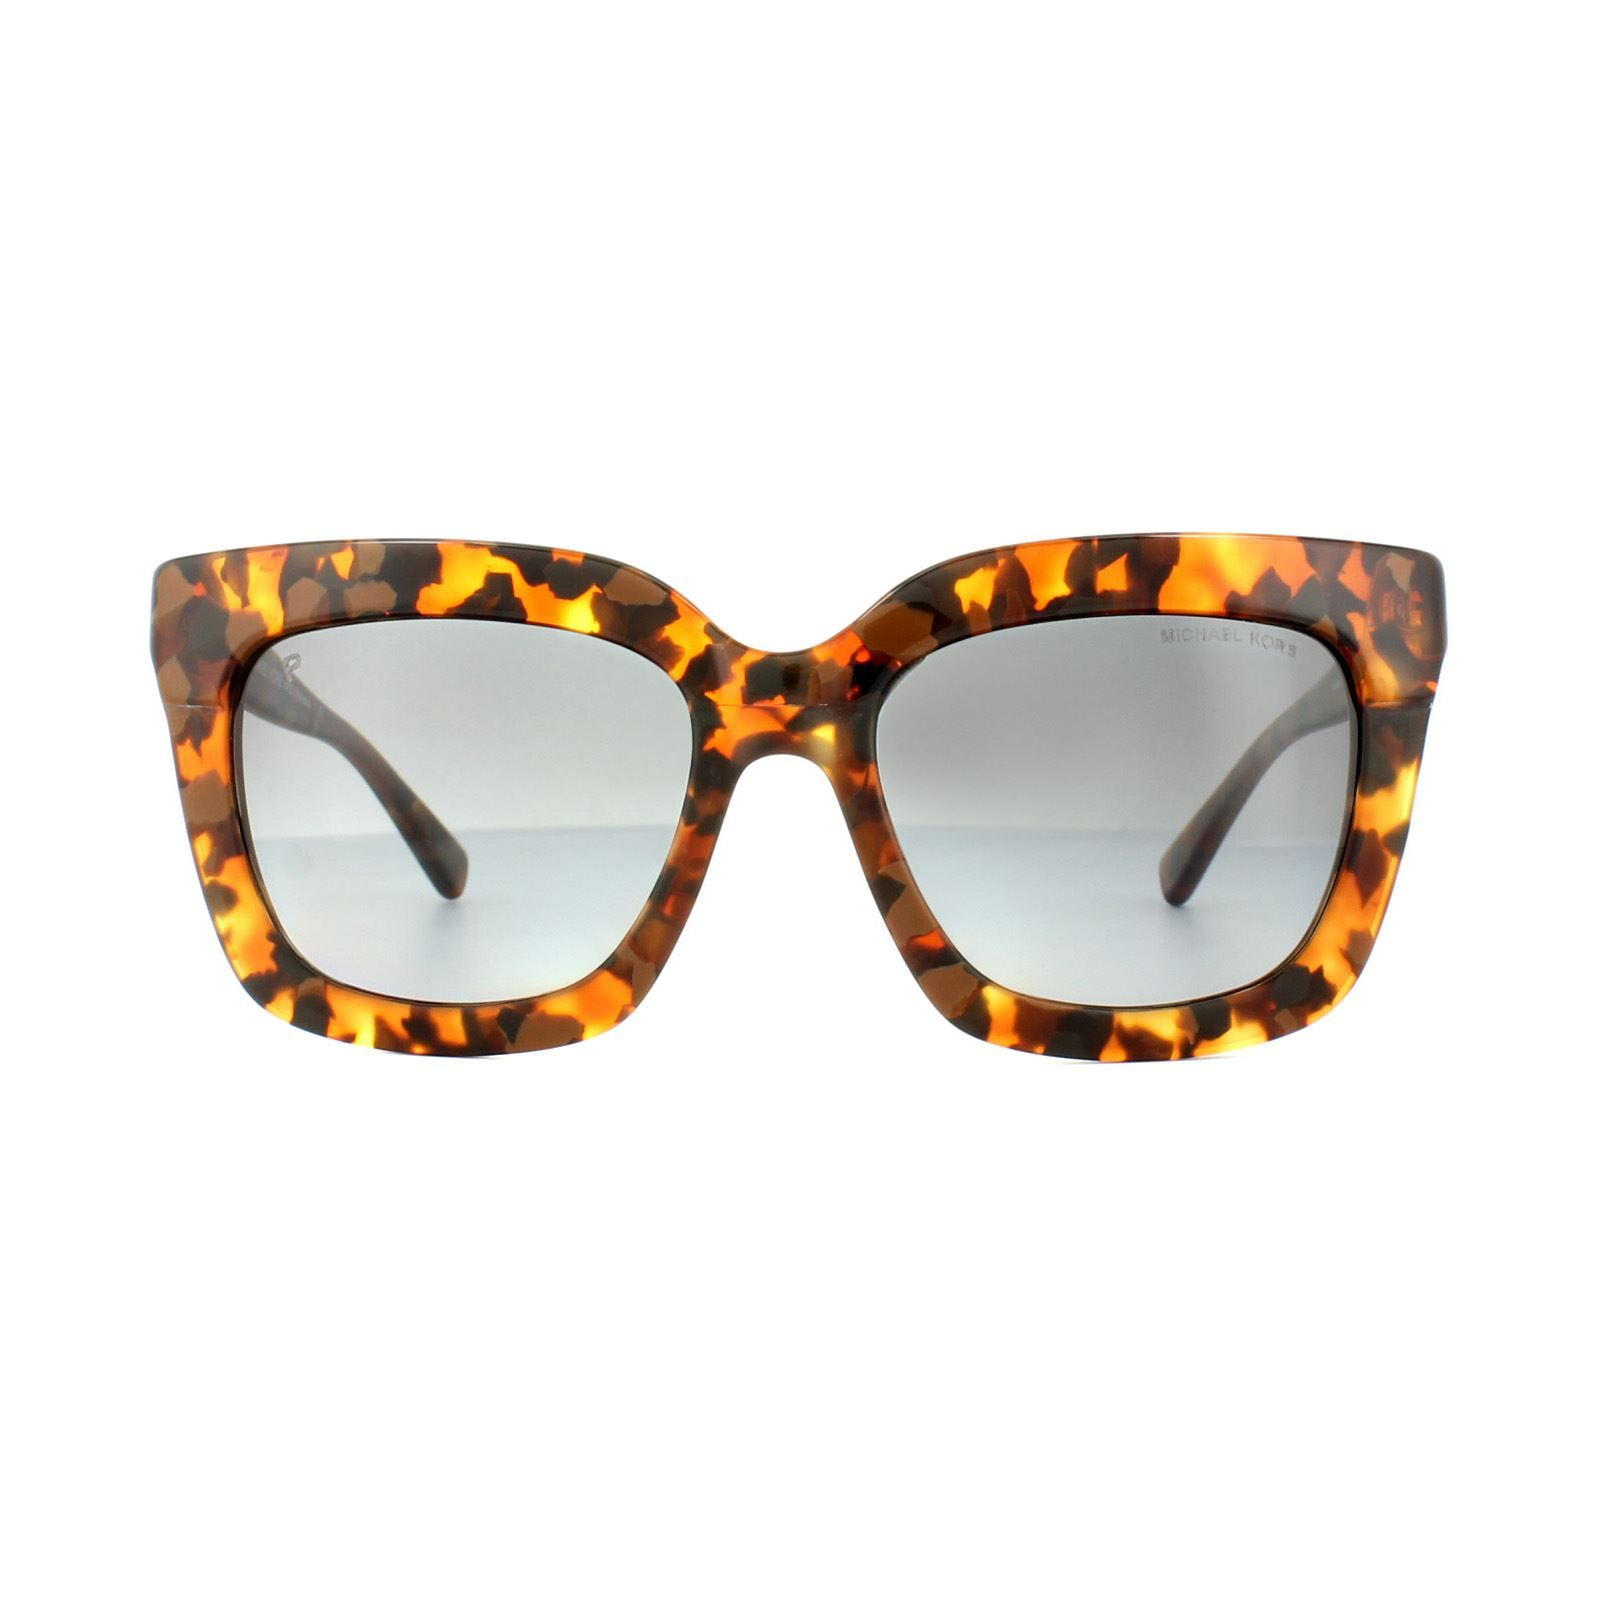 Michael Kors Sunglasses Polynesia MK2013 3066T3 Brown Tortoise Grey Gradient Polarized